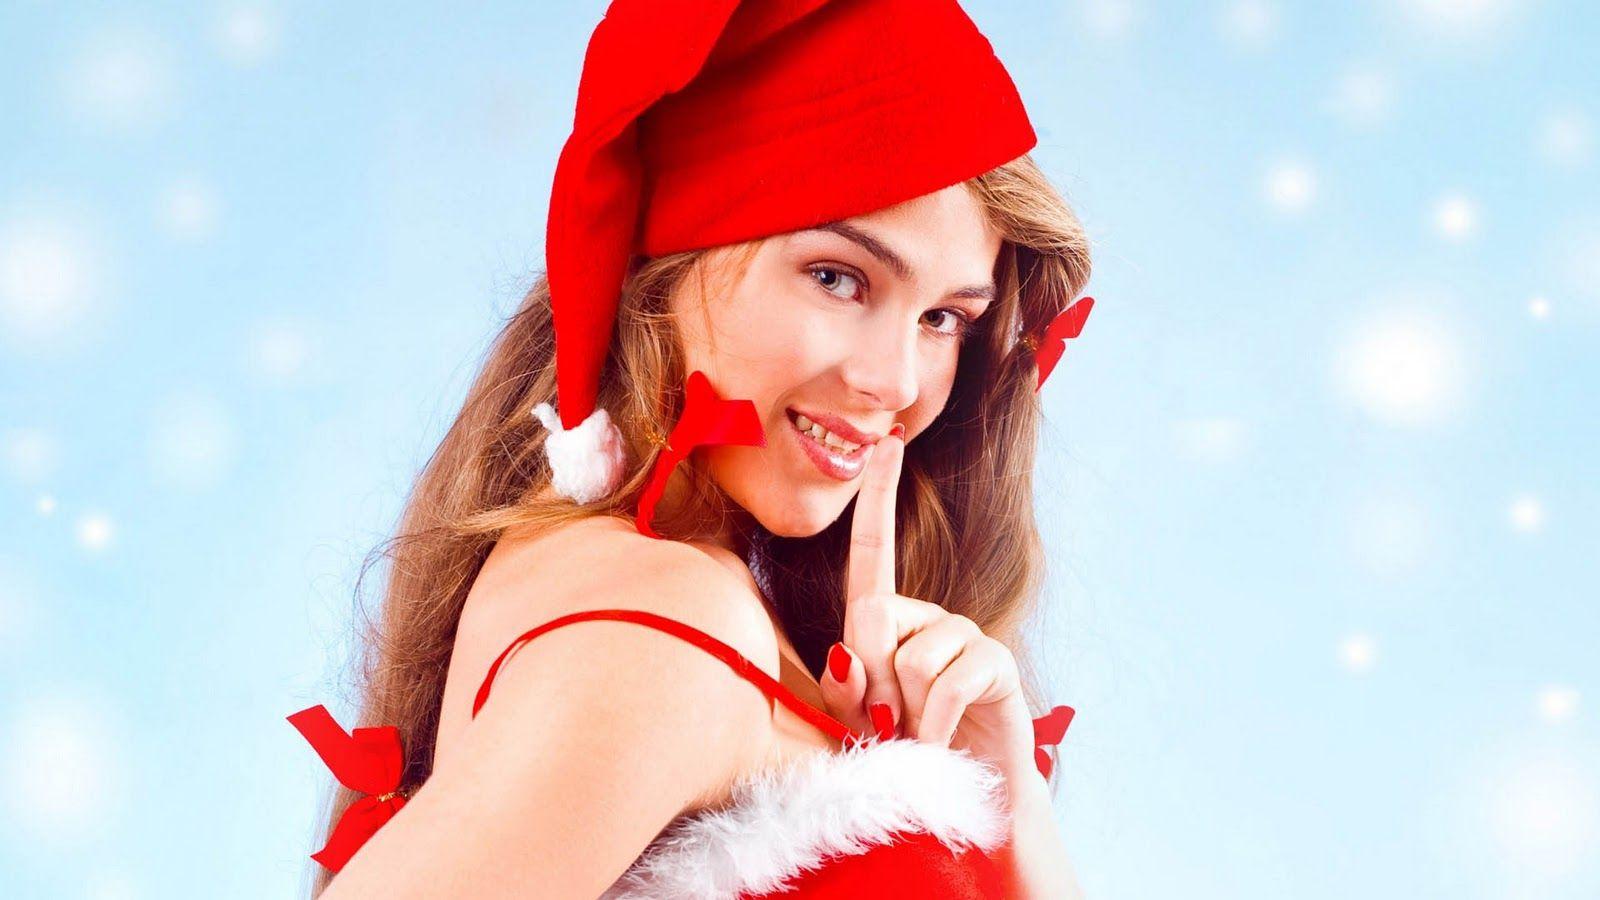 Cute Girls Sexy Beautiful Christmas Hd Wallpapers  -3071